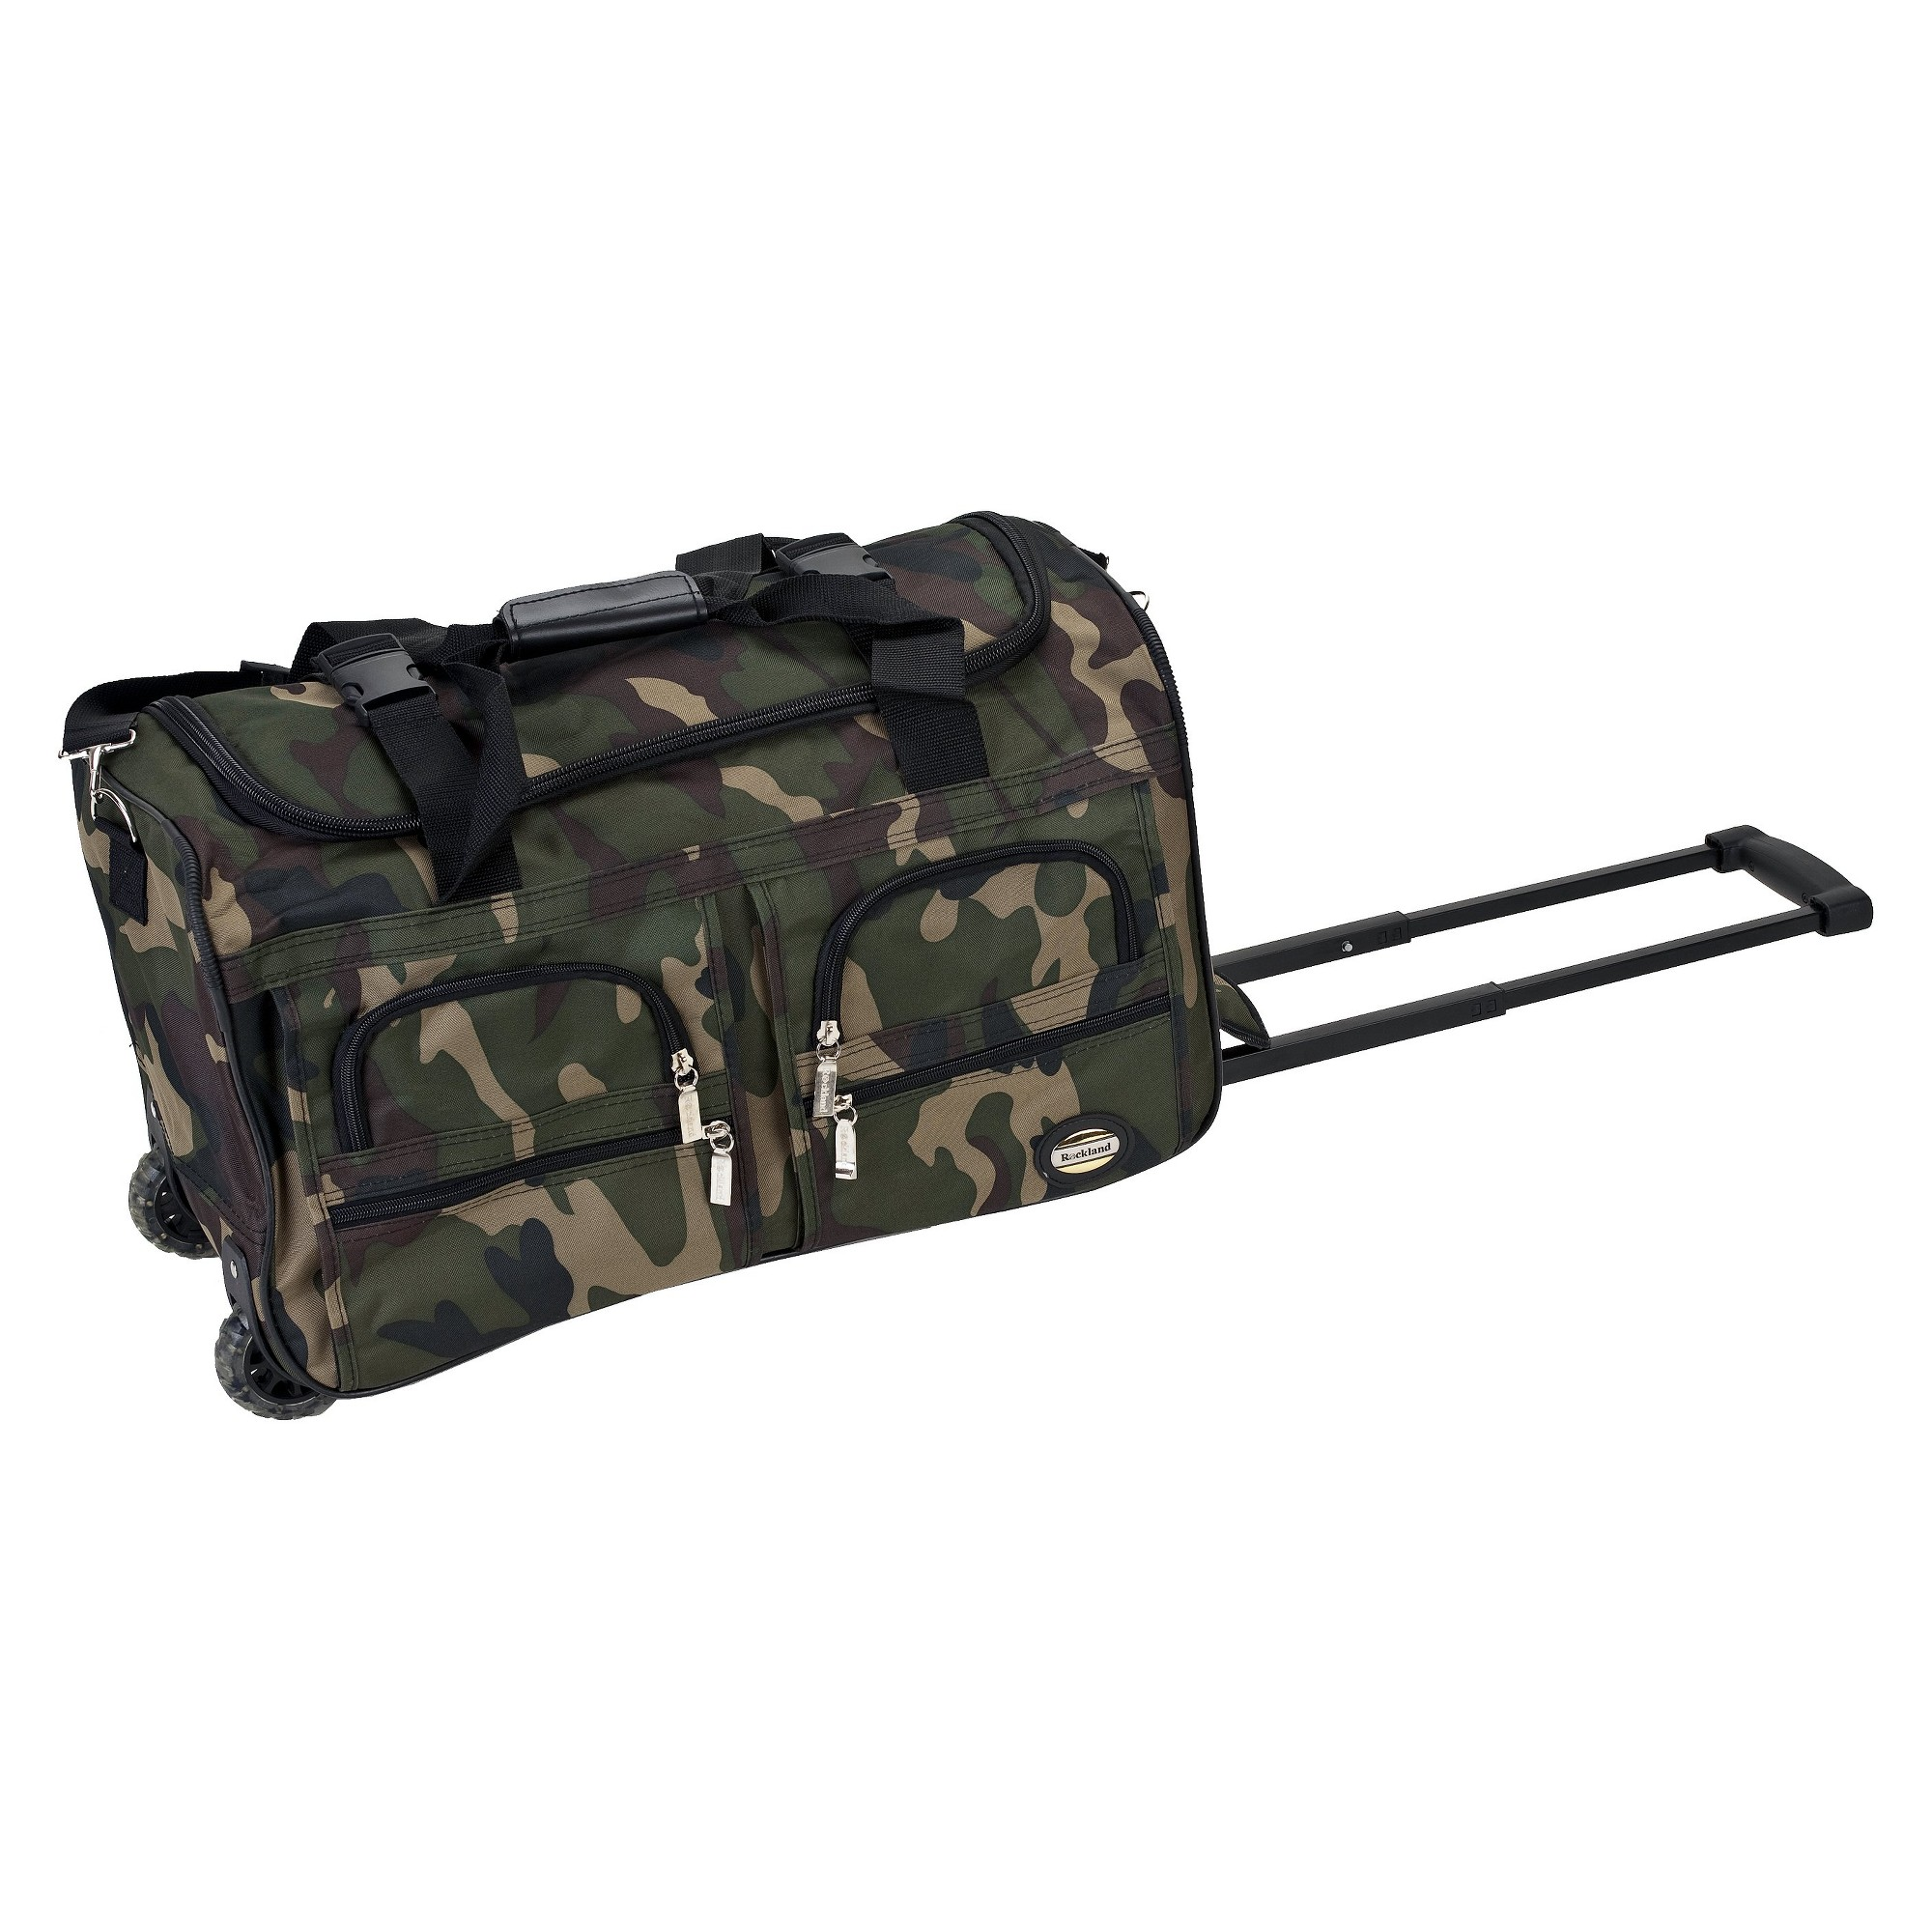 'Rockland 22'' Rolling Duffel Bag - Camo, Size: Large, Green Drab'